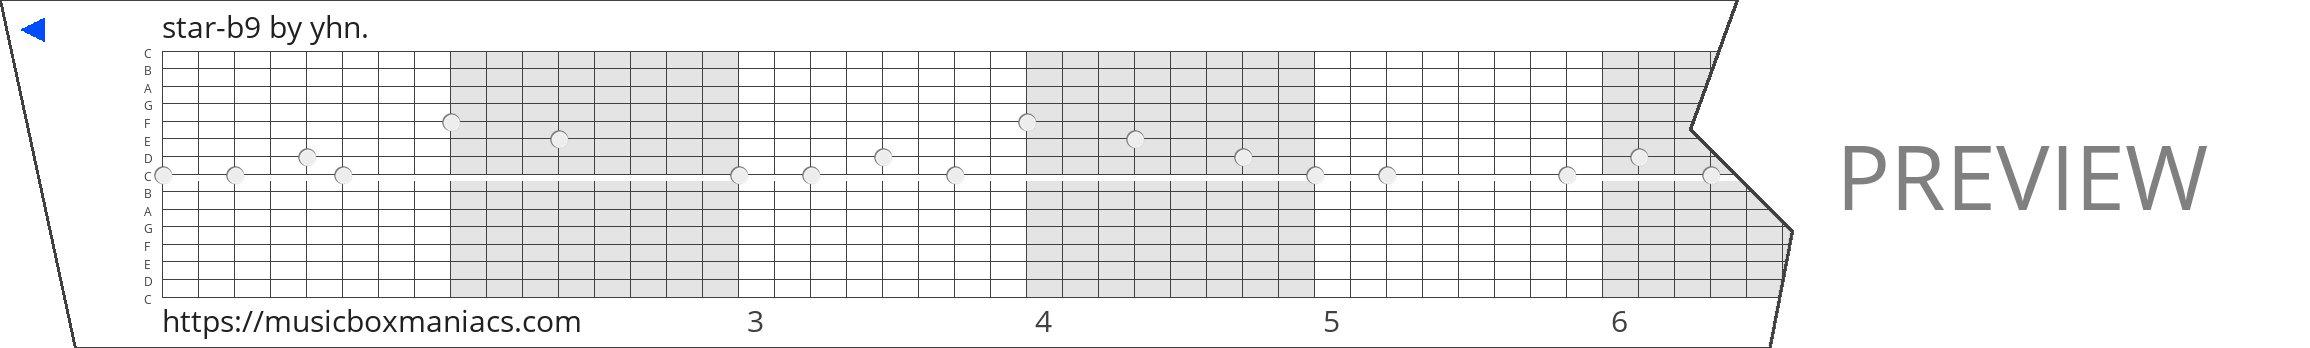 star-b9 15 note music box paper strip